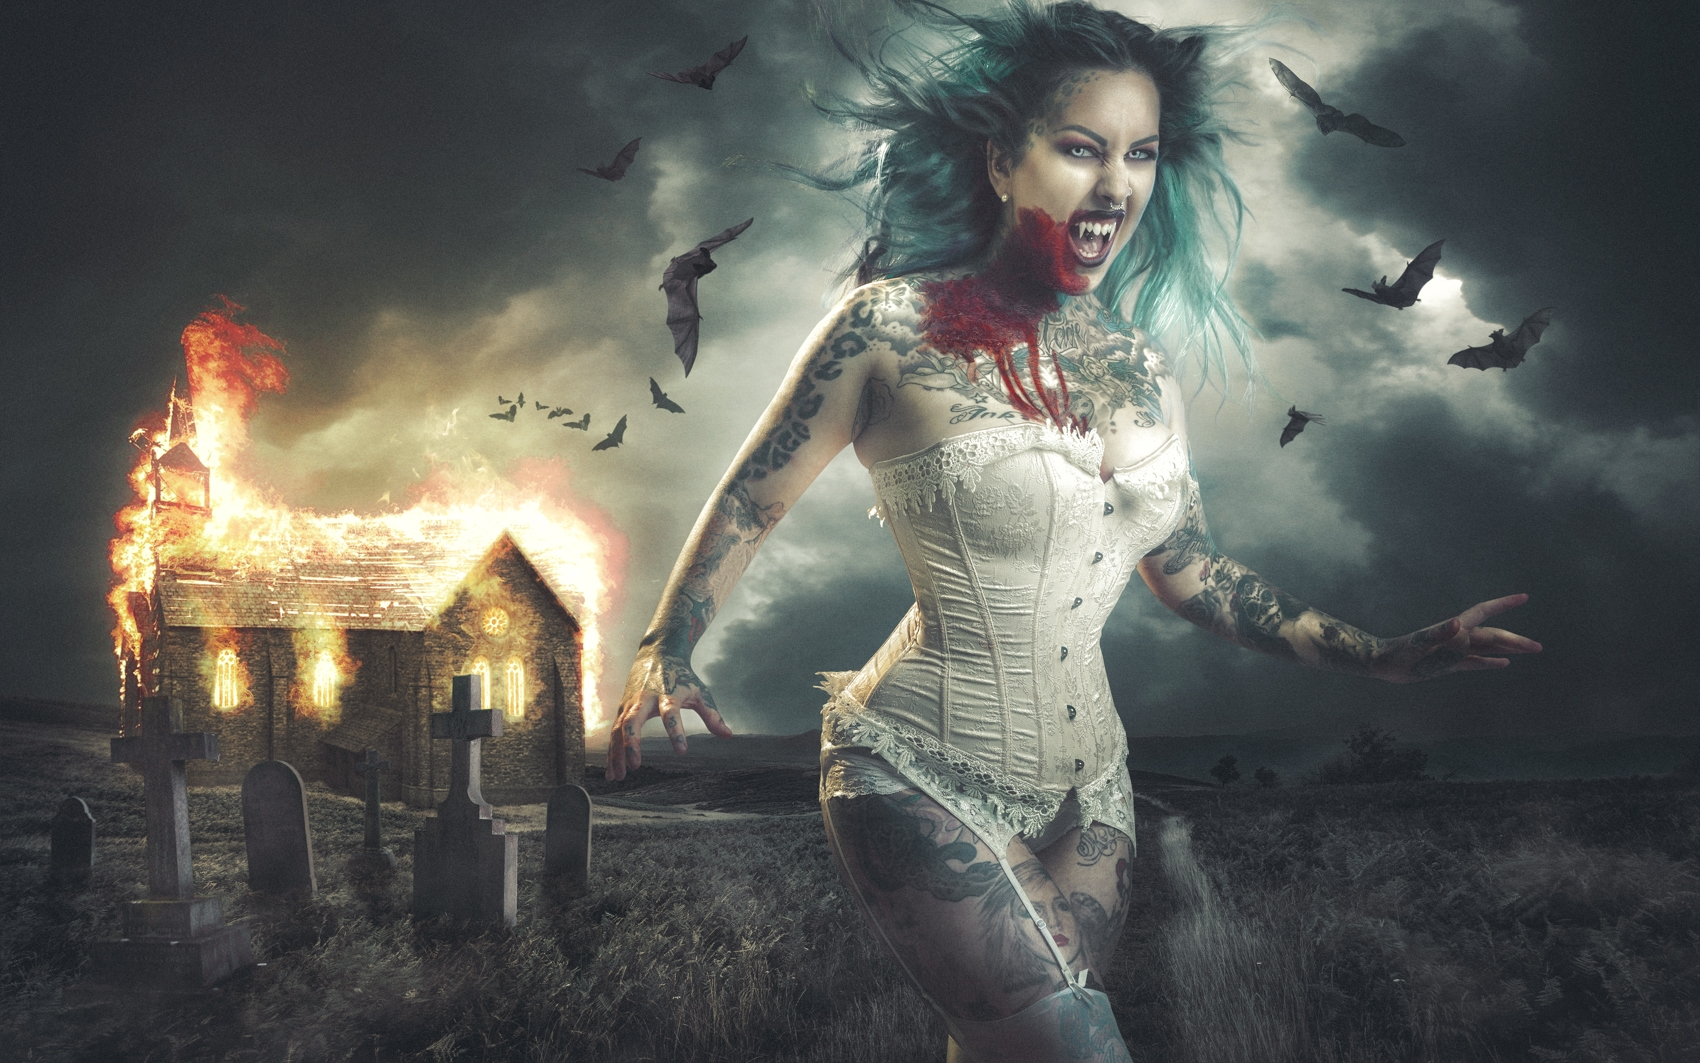 Free Photo Night Vampire Cemetery House Fire Burning Horror